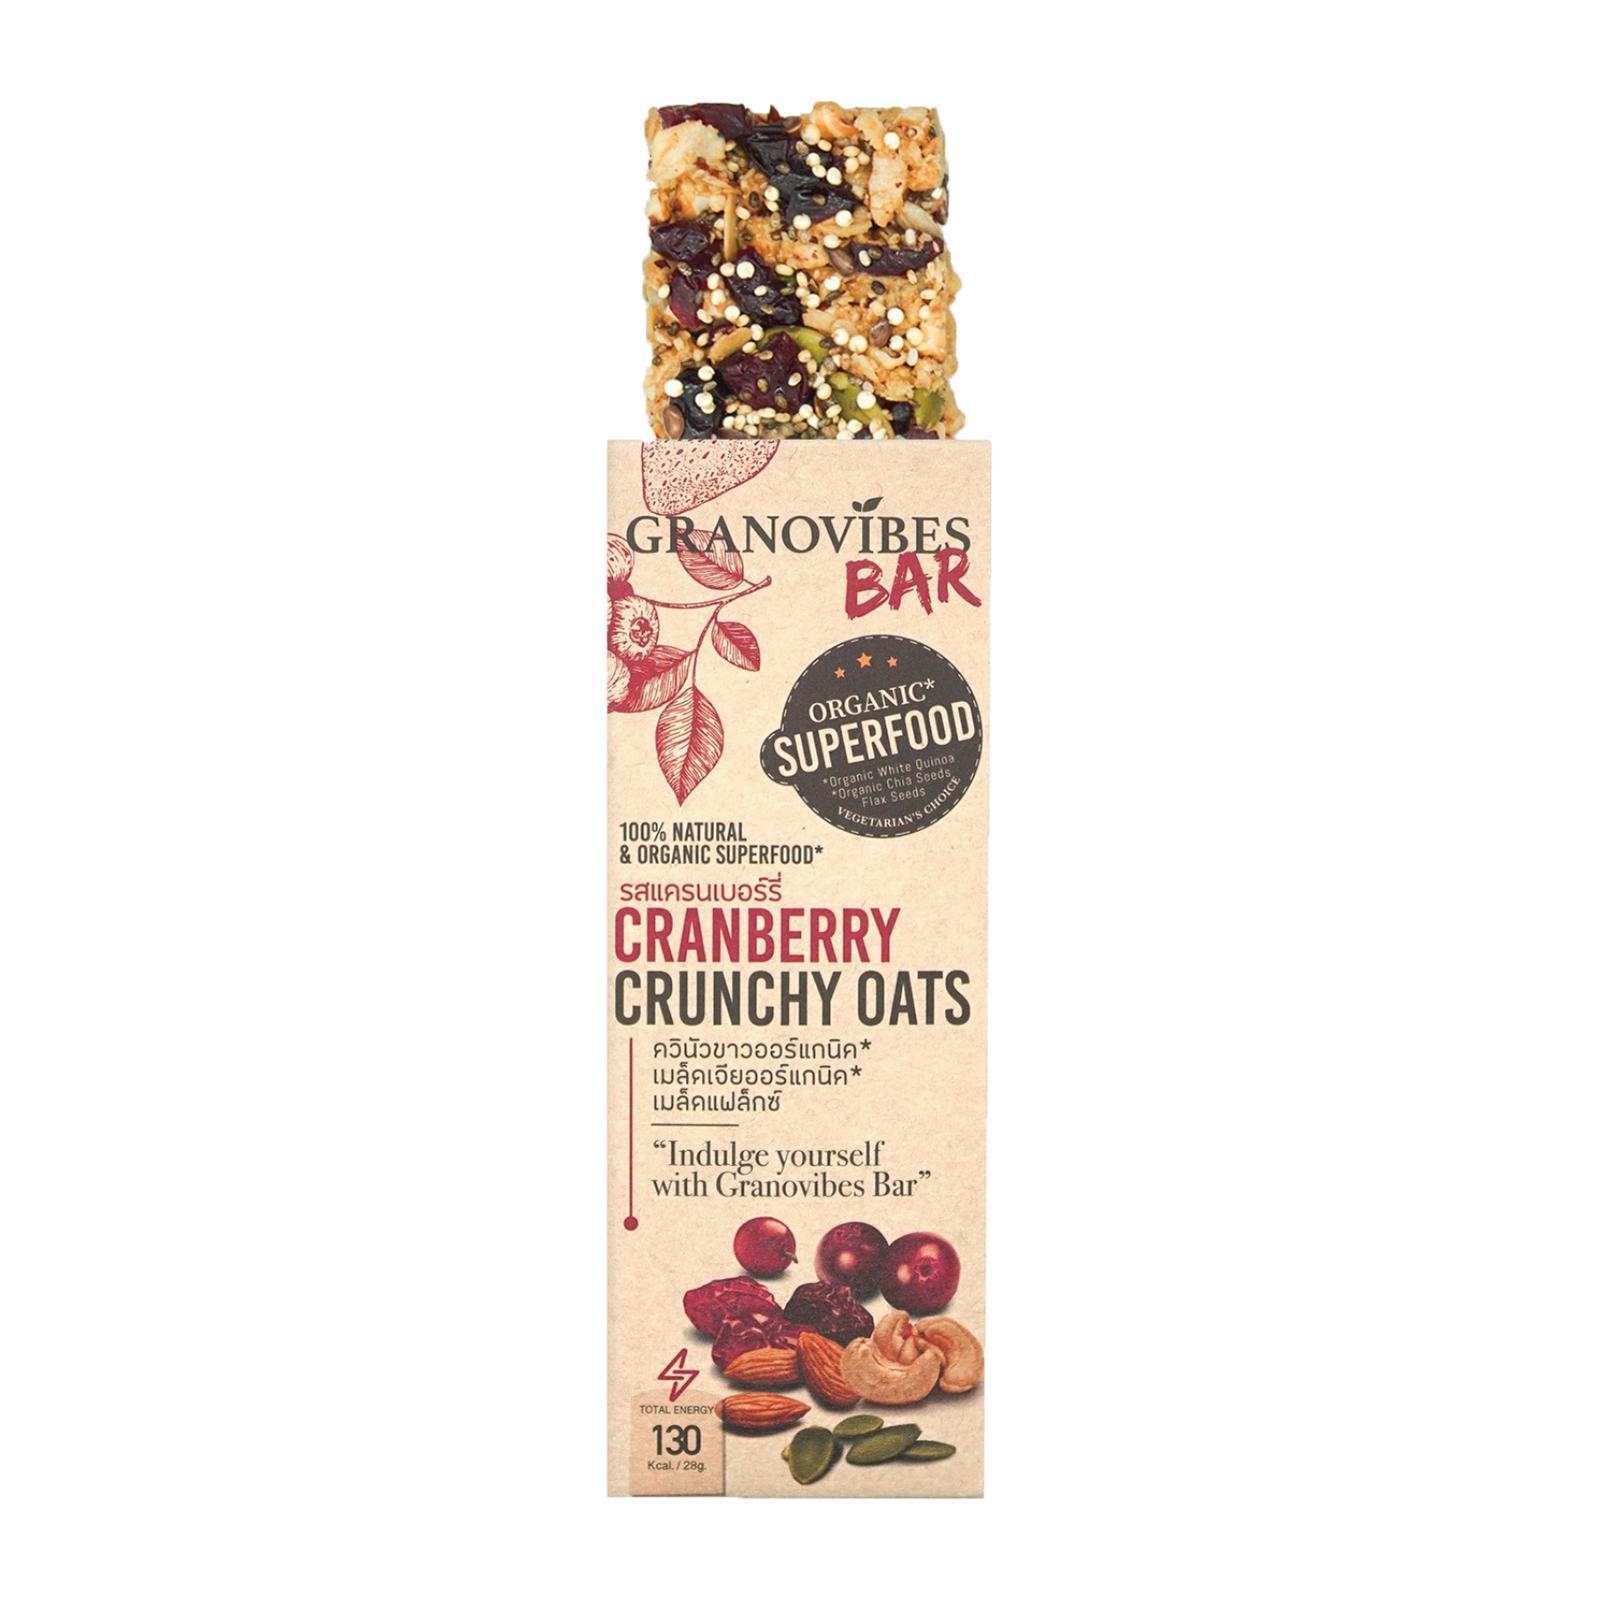 Granovibes Cranberry Crunchy Oats Granola Bar